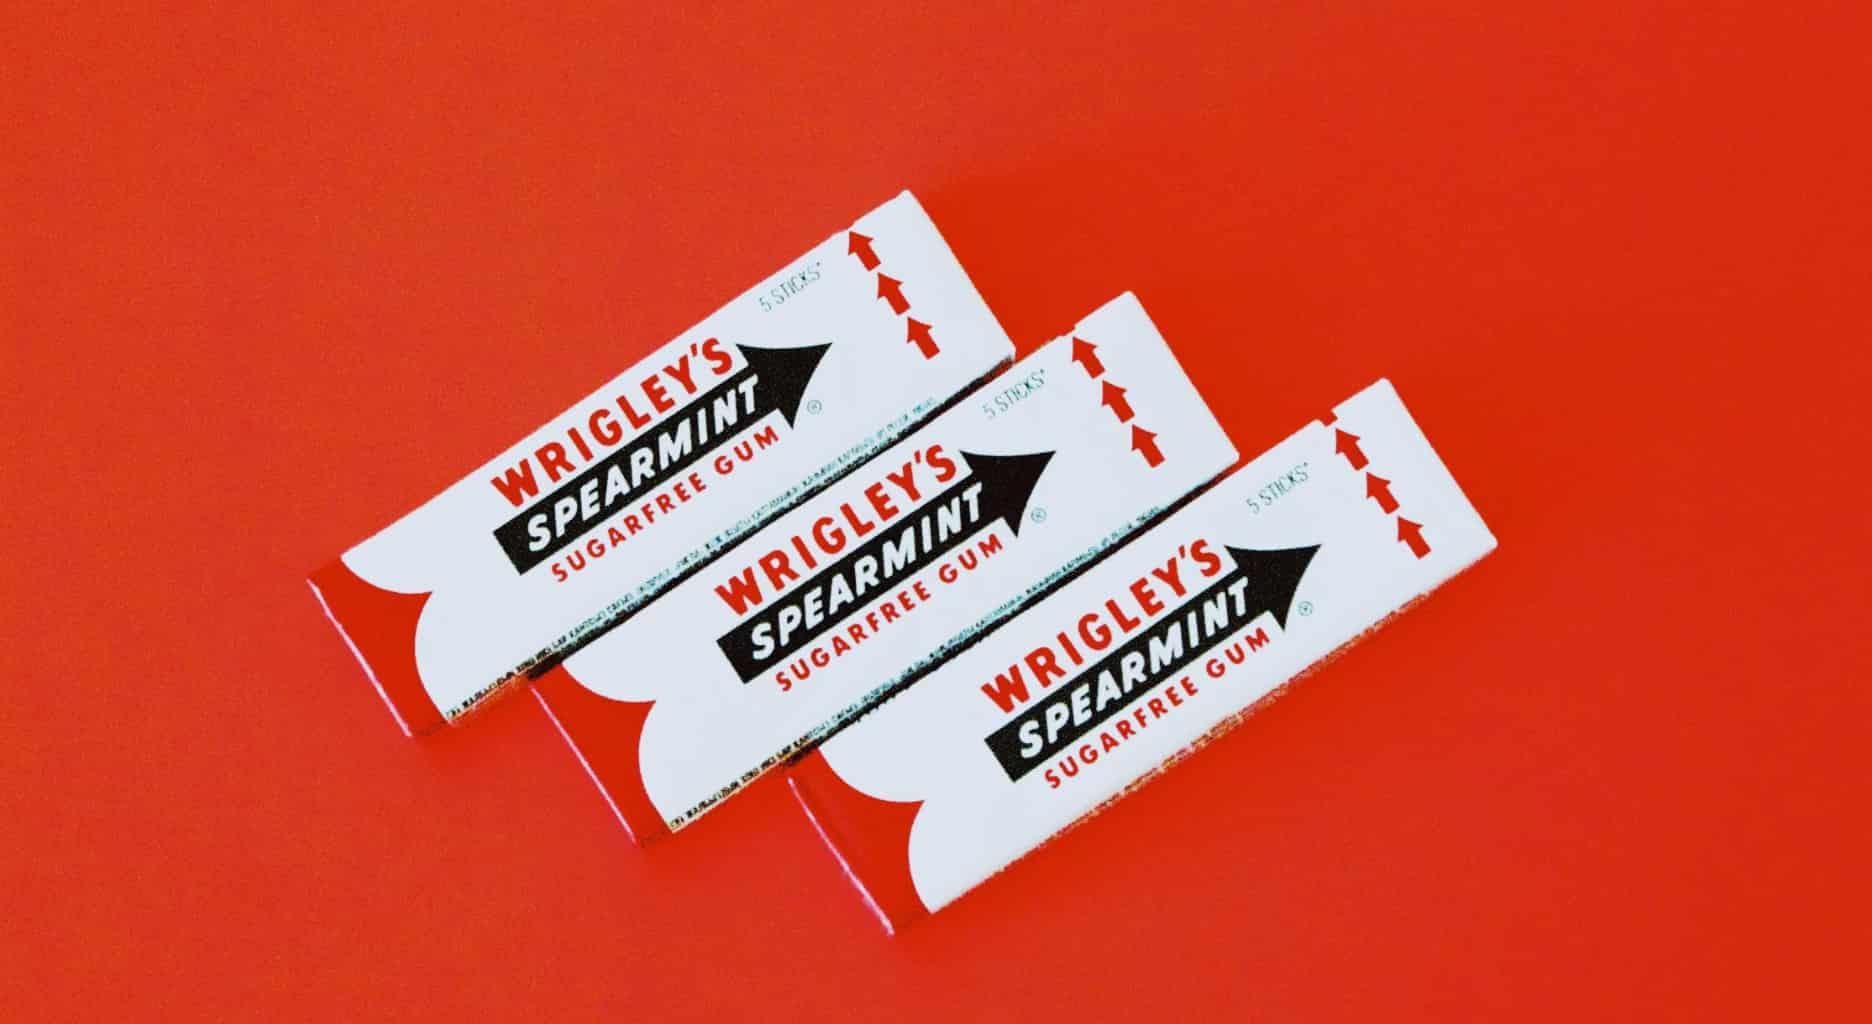 wrigleys gum